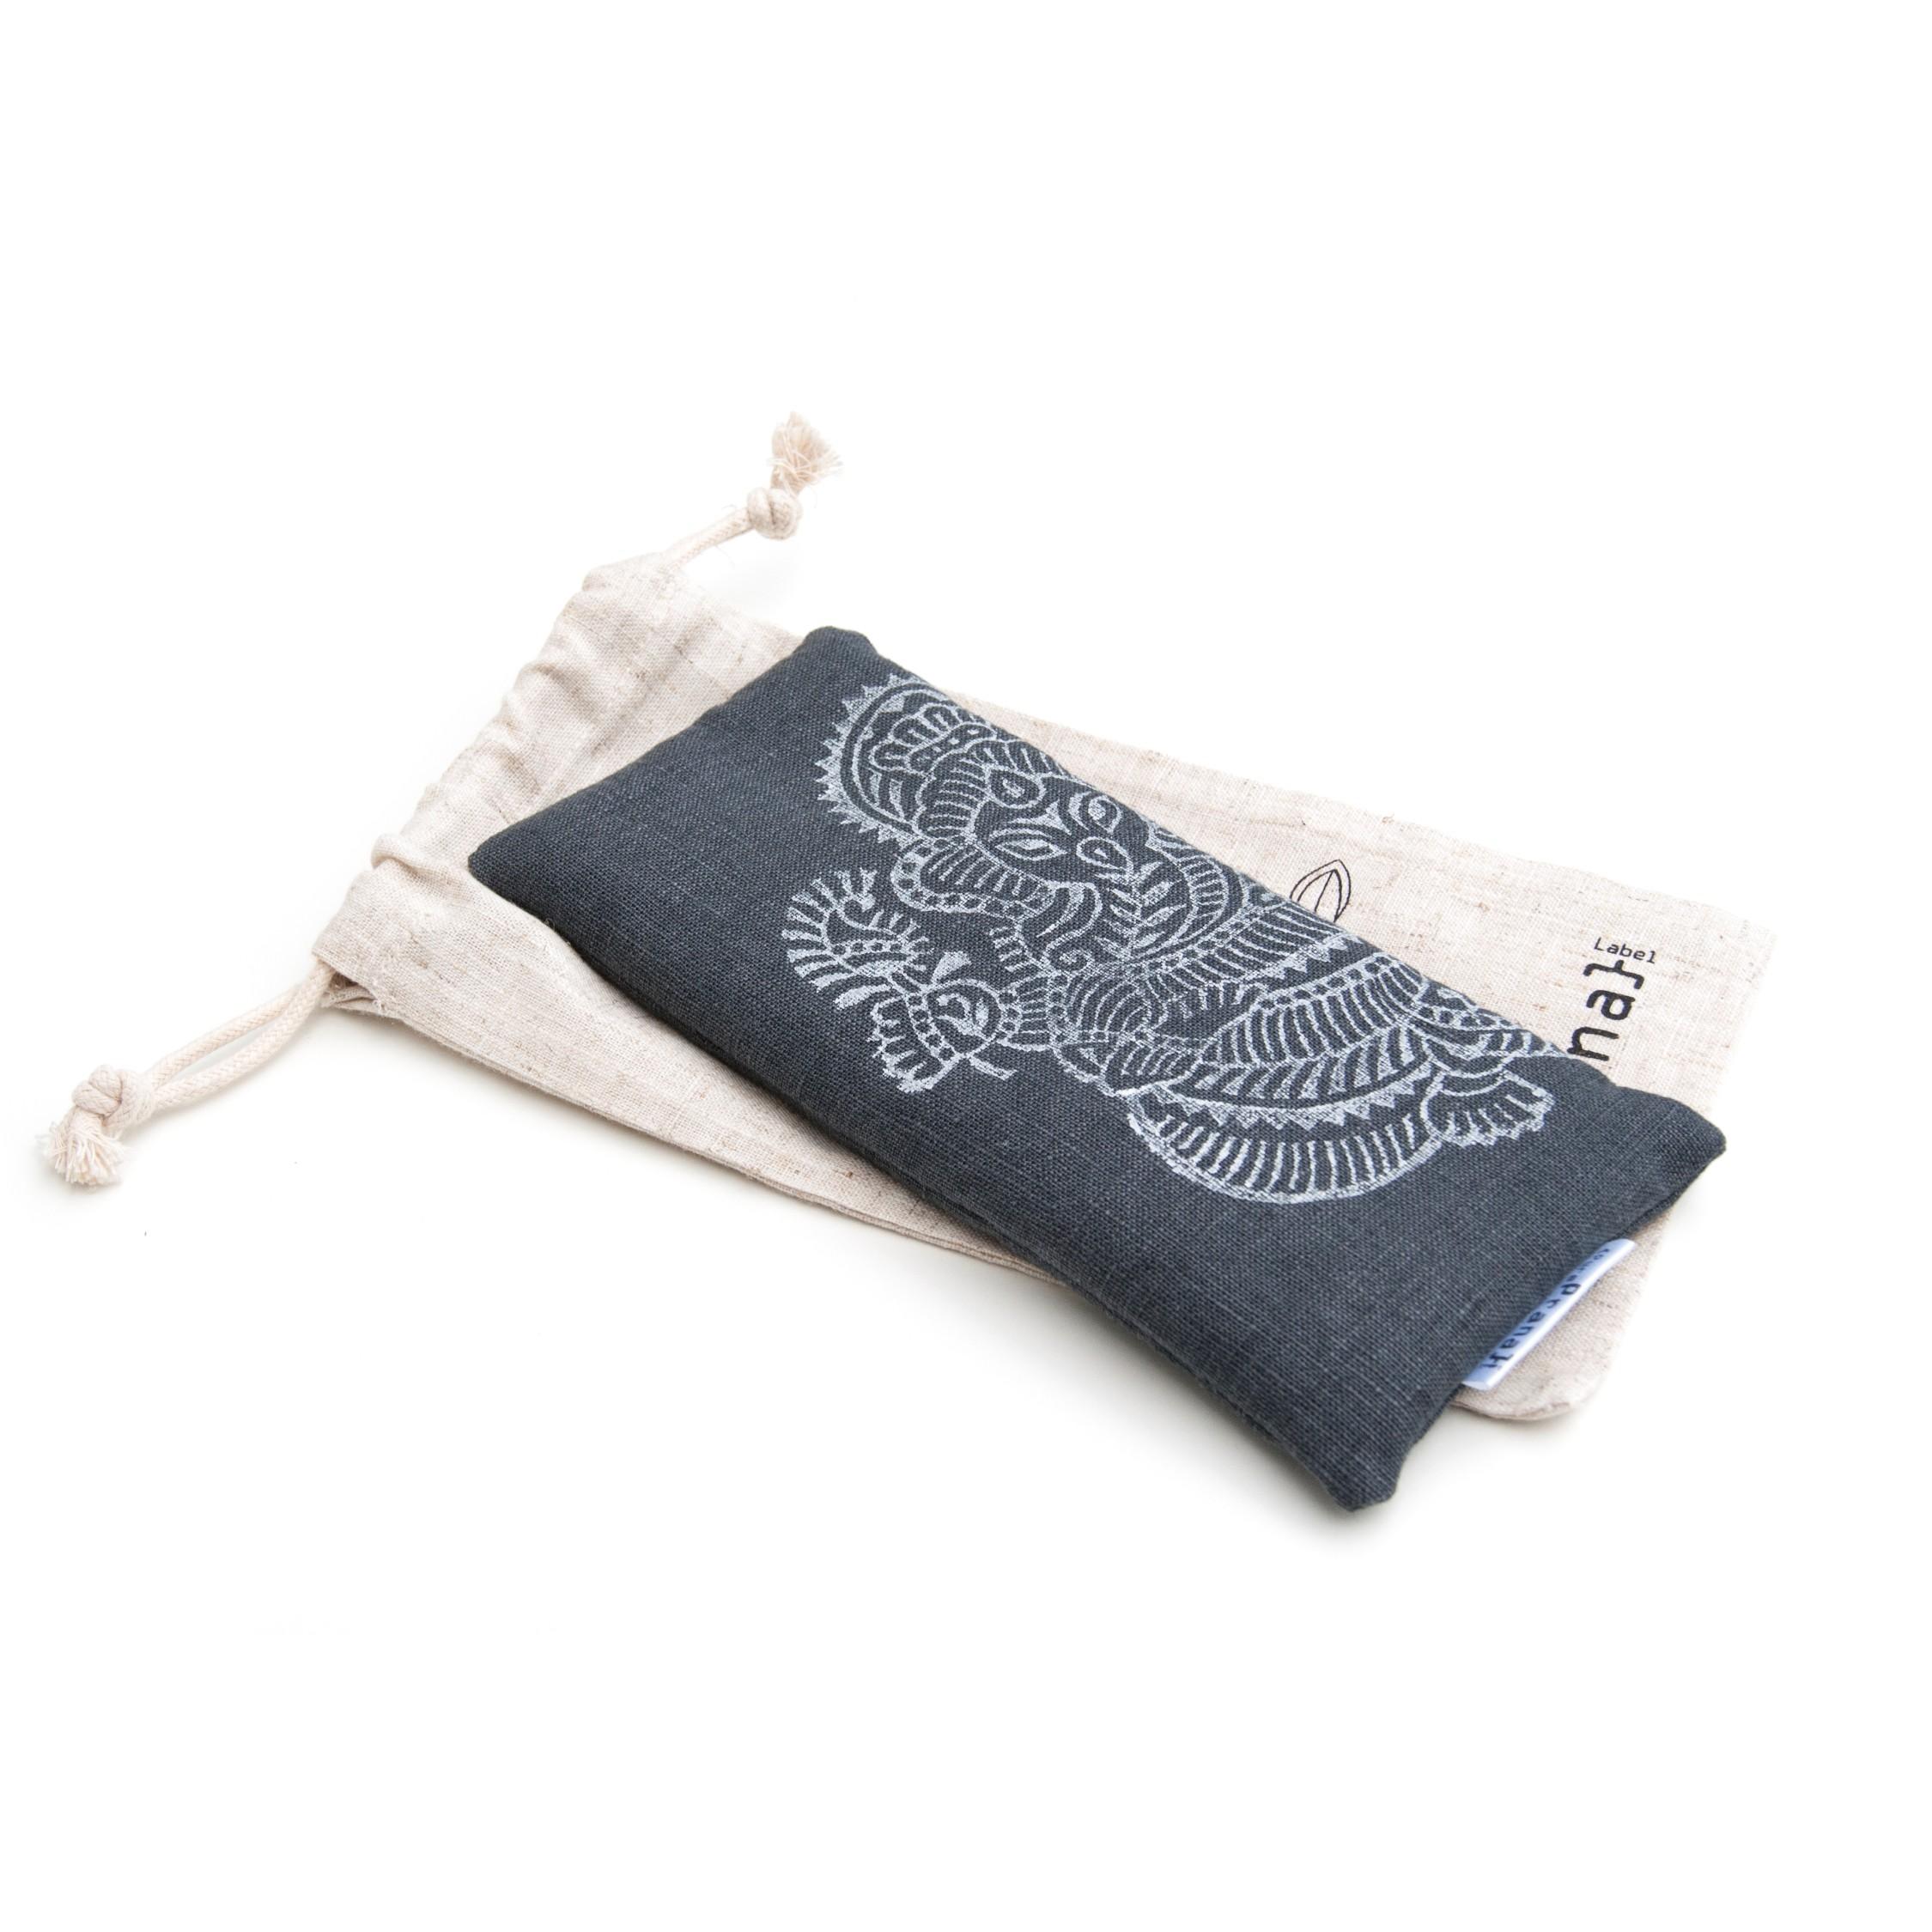 Yoga eye pillow Ganesh in dark gray